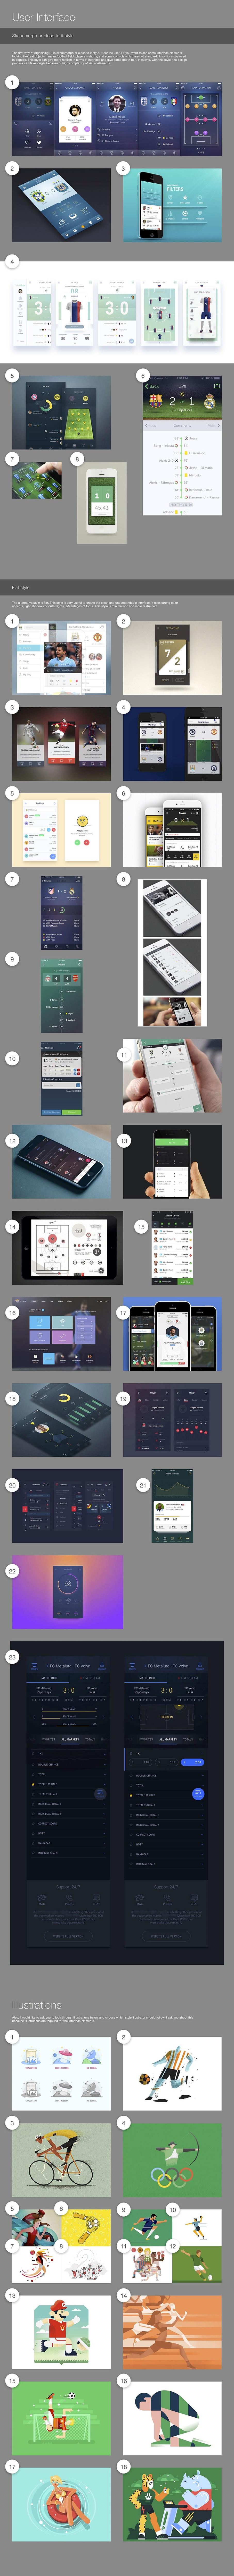 moodboard sport app UI design